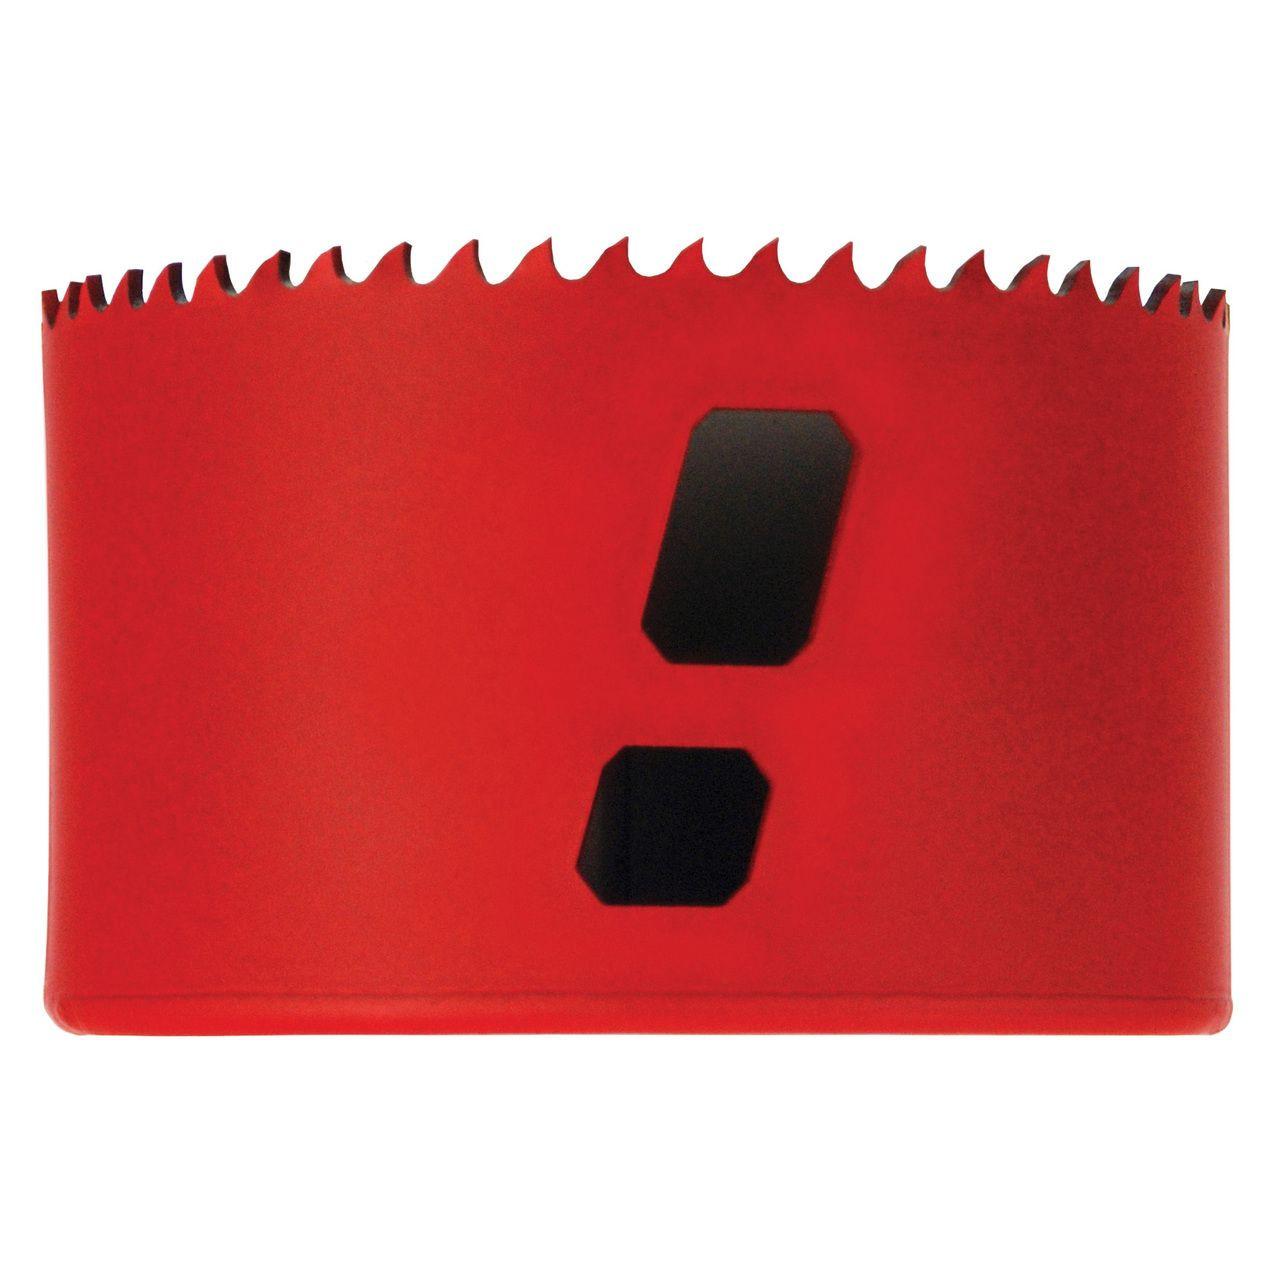 Killer Filter Replacement for PUROLATOR//FACET 30P0EAM202F1 100-6466-14697